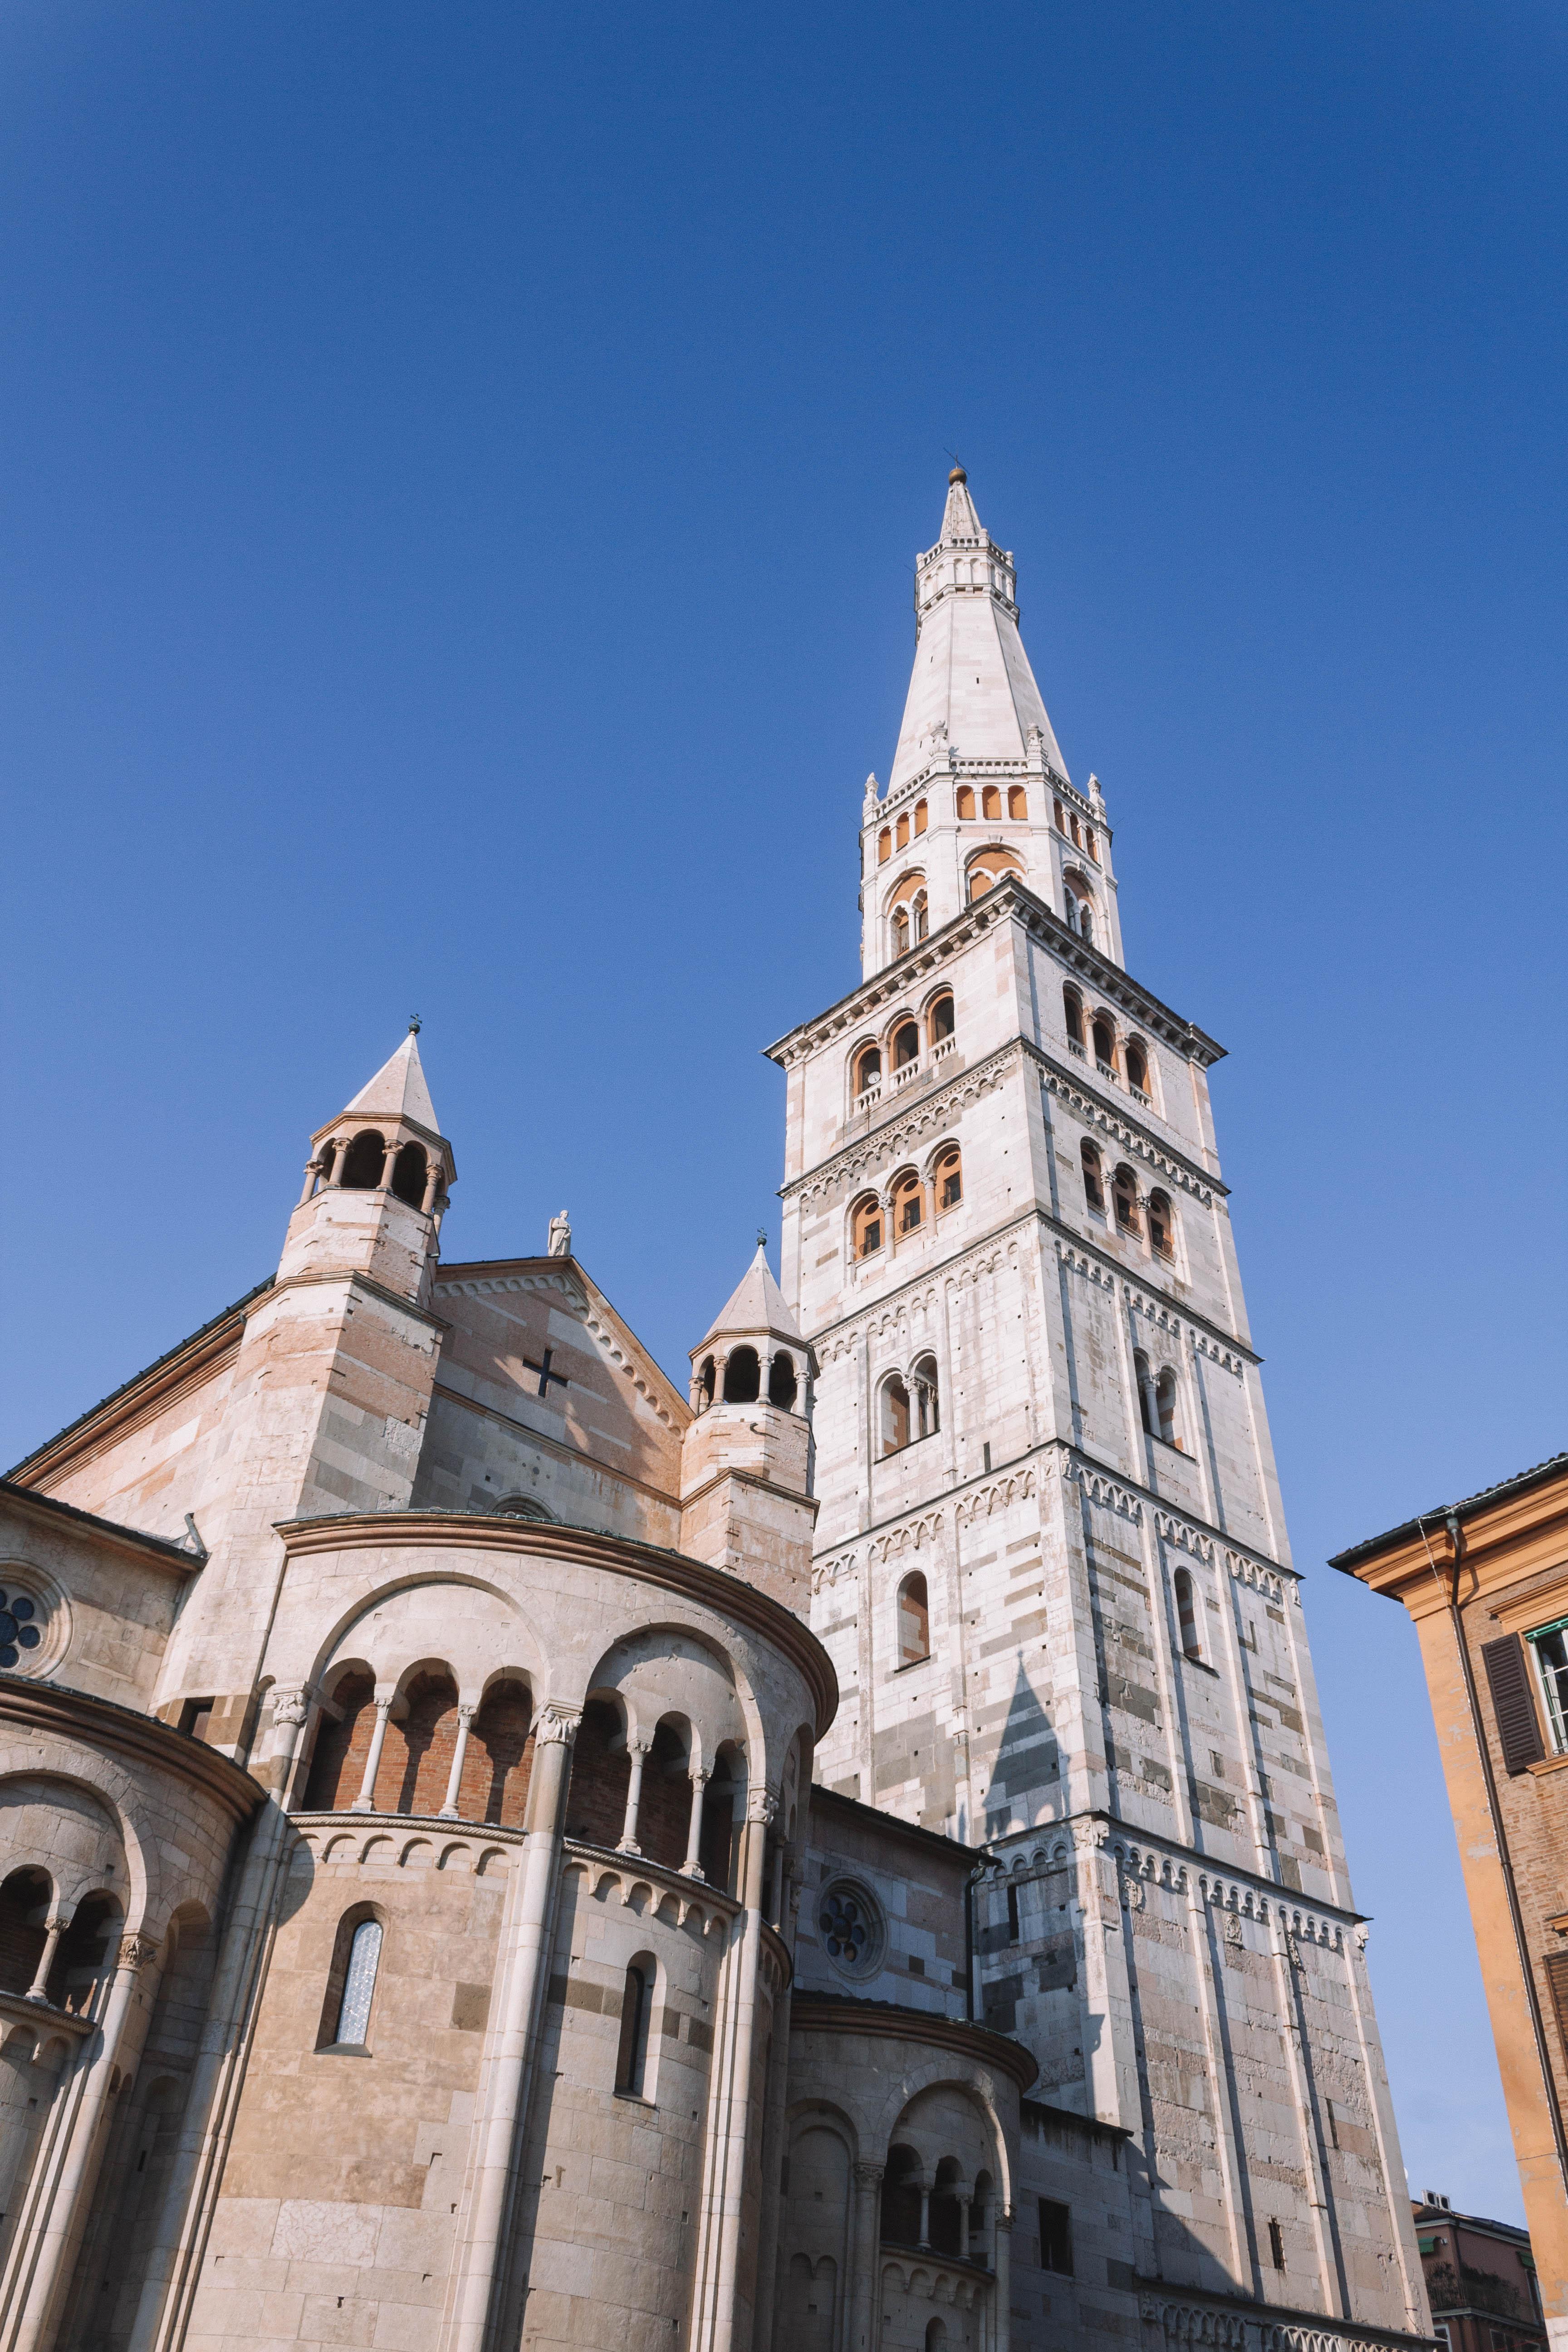 Torre Ghirlandina